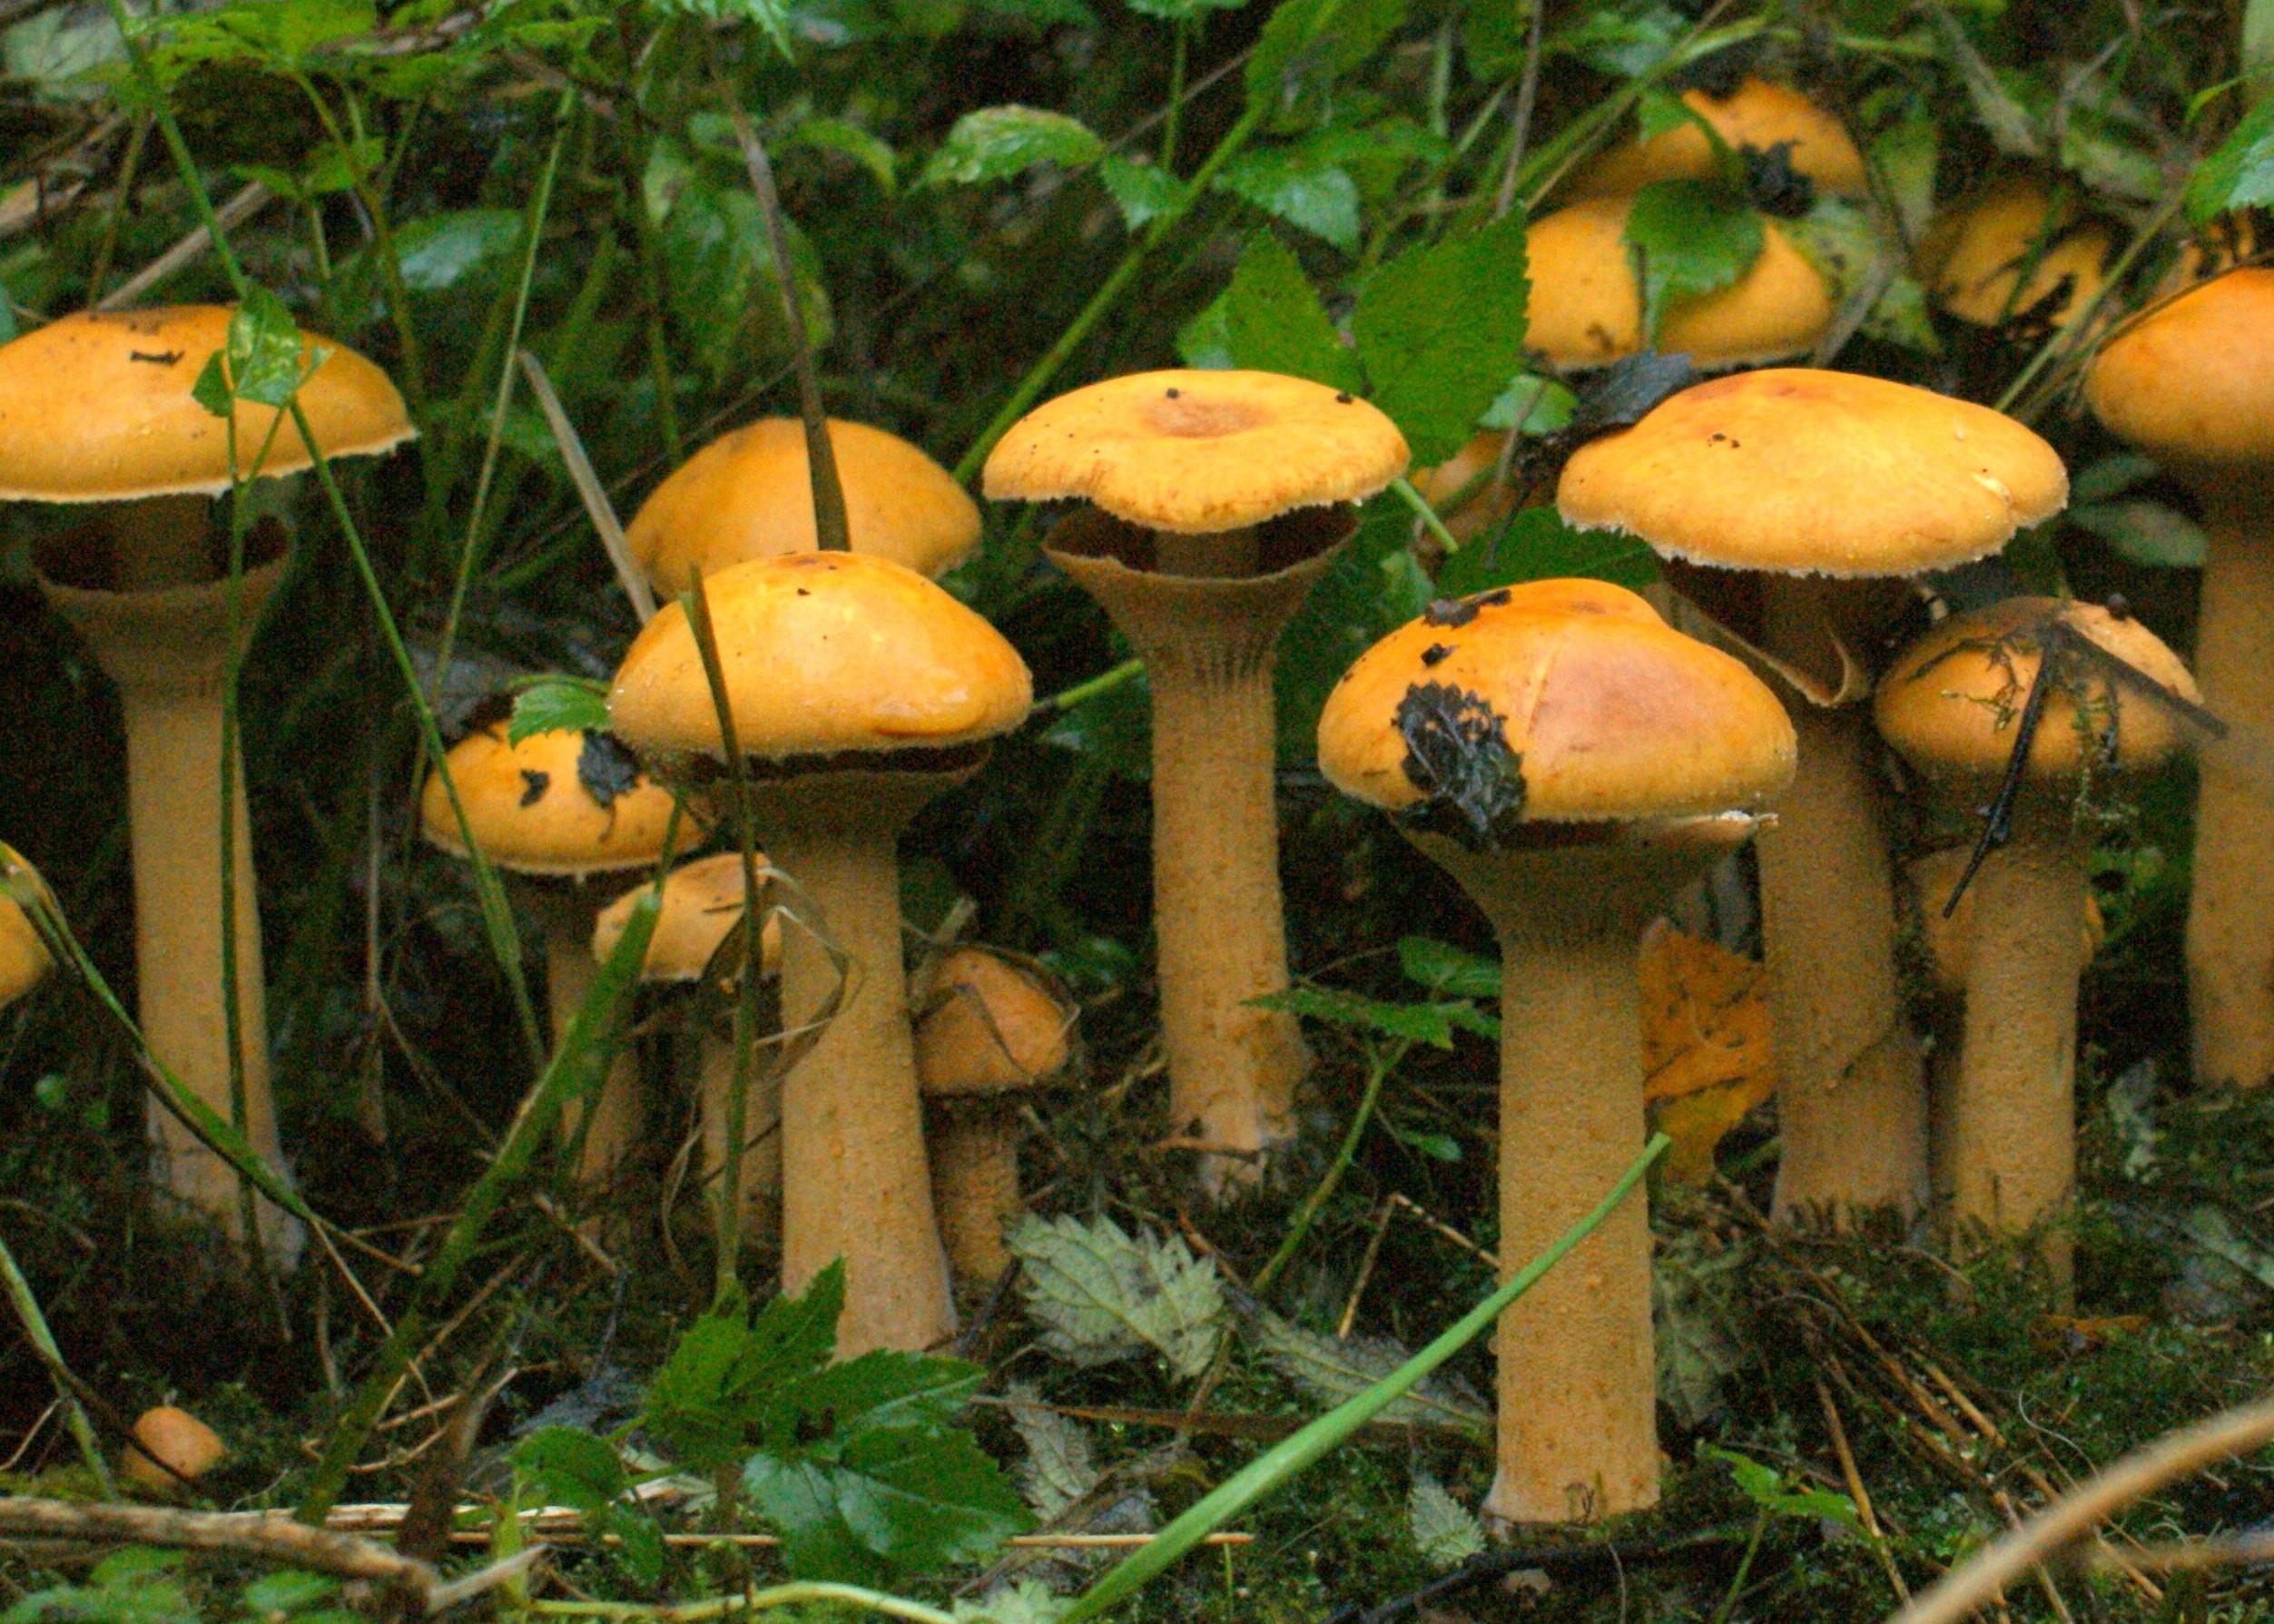 Sydfynske svampedage trente Mølle og Øhavsmuseet